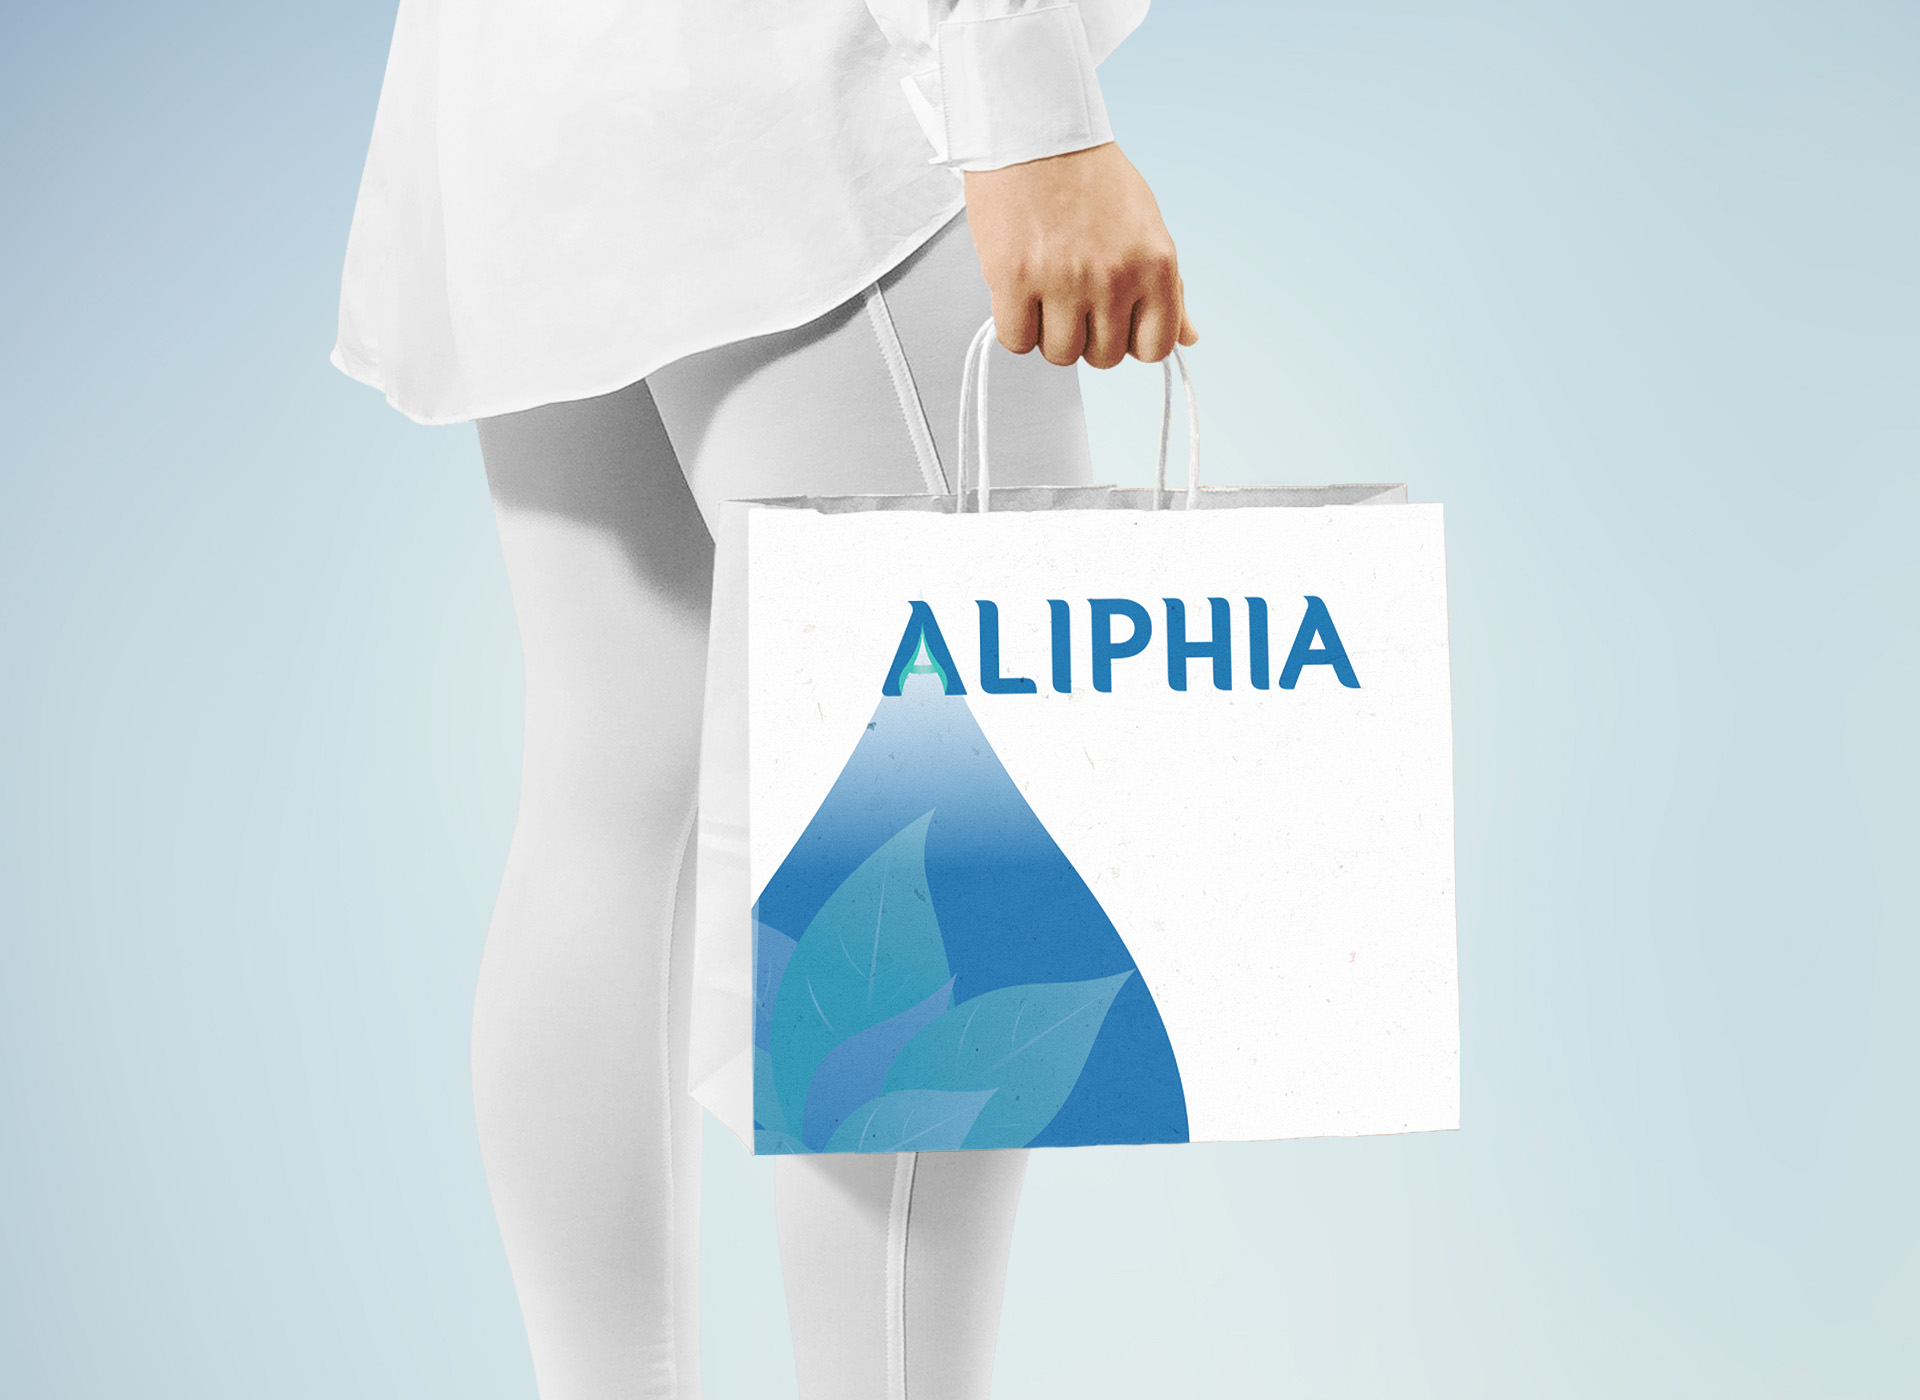 portofoliu branding aliphia bag